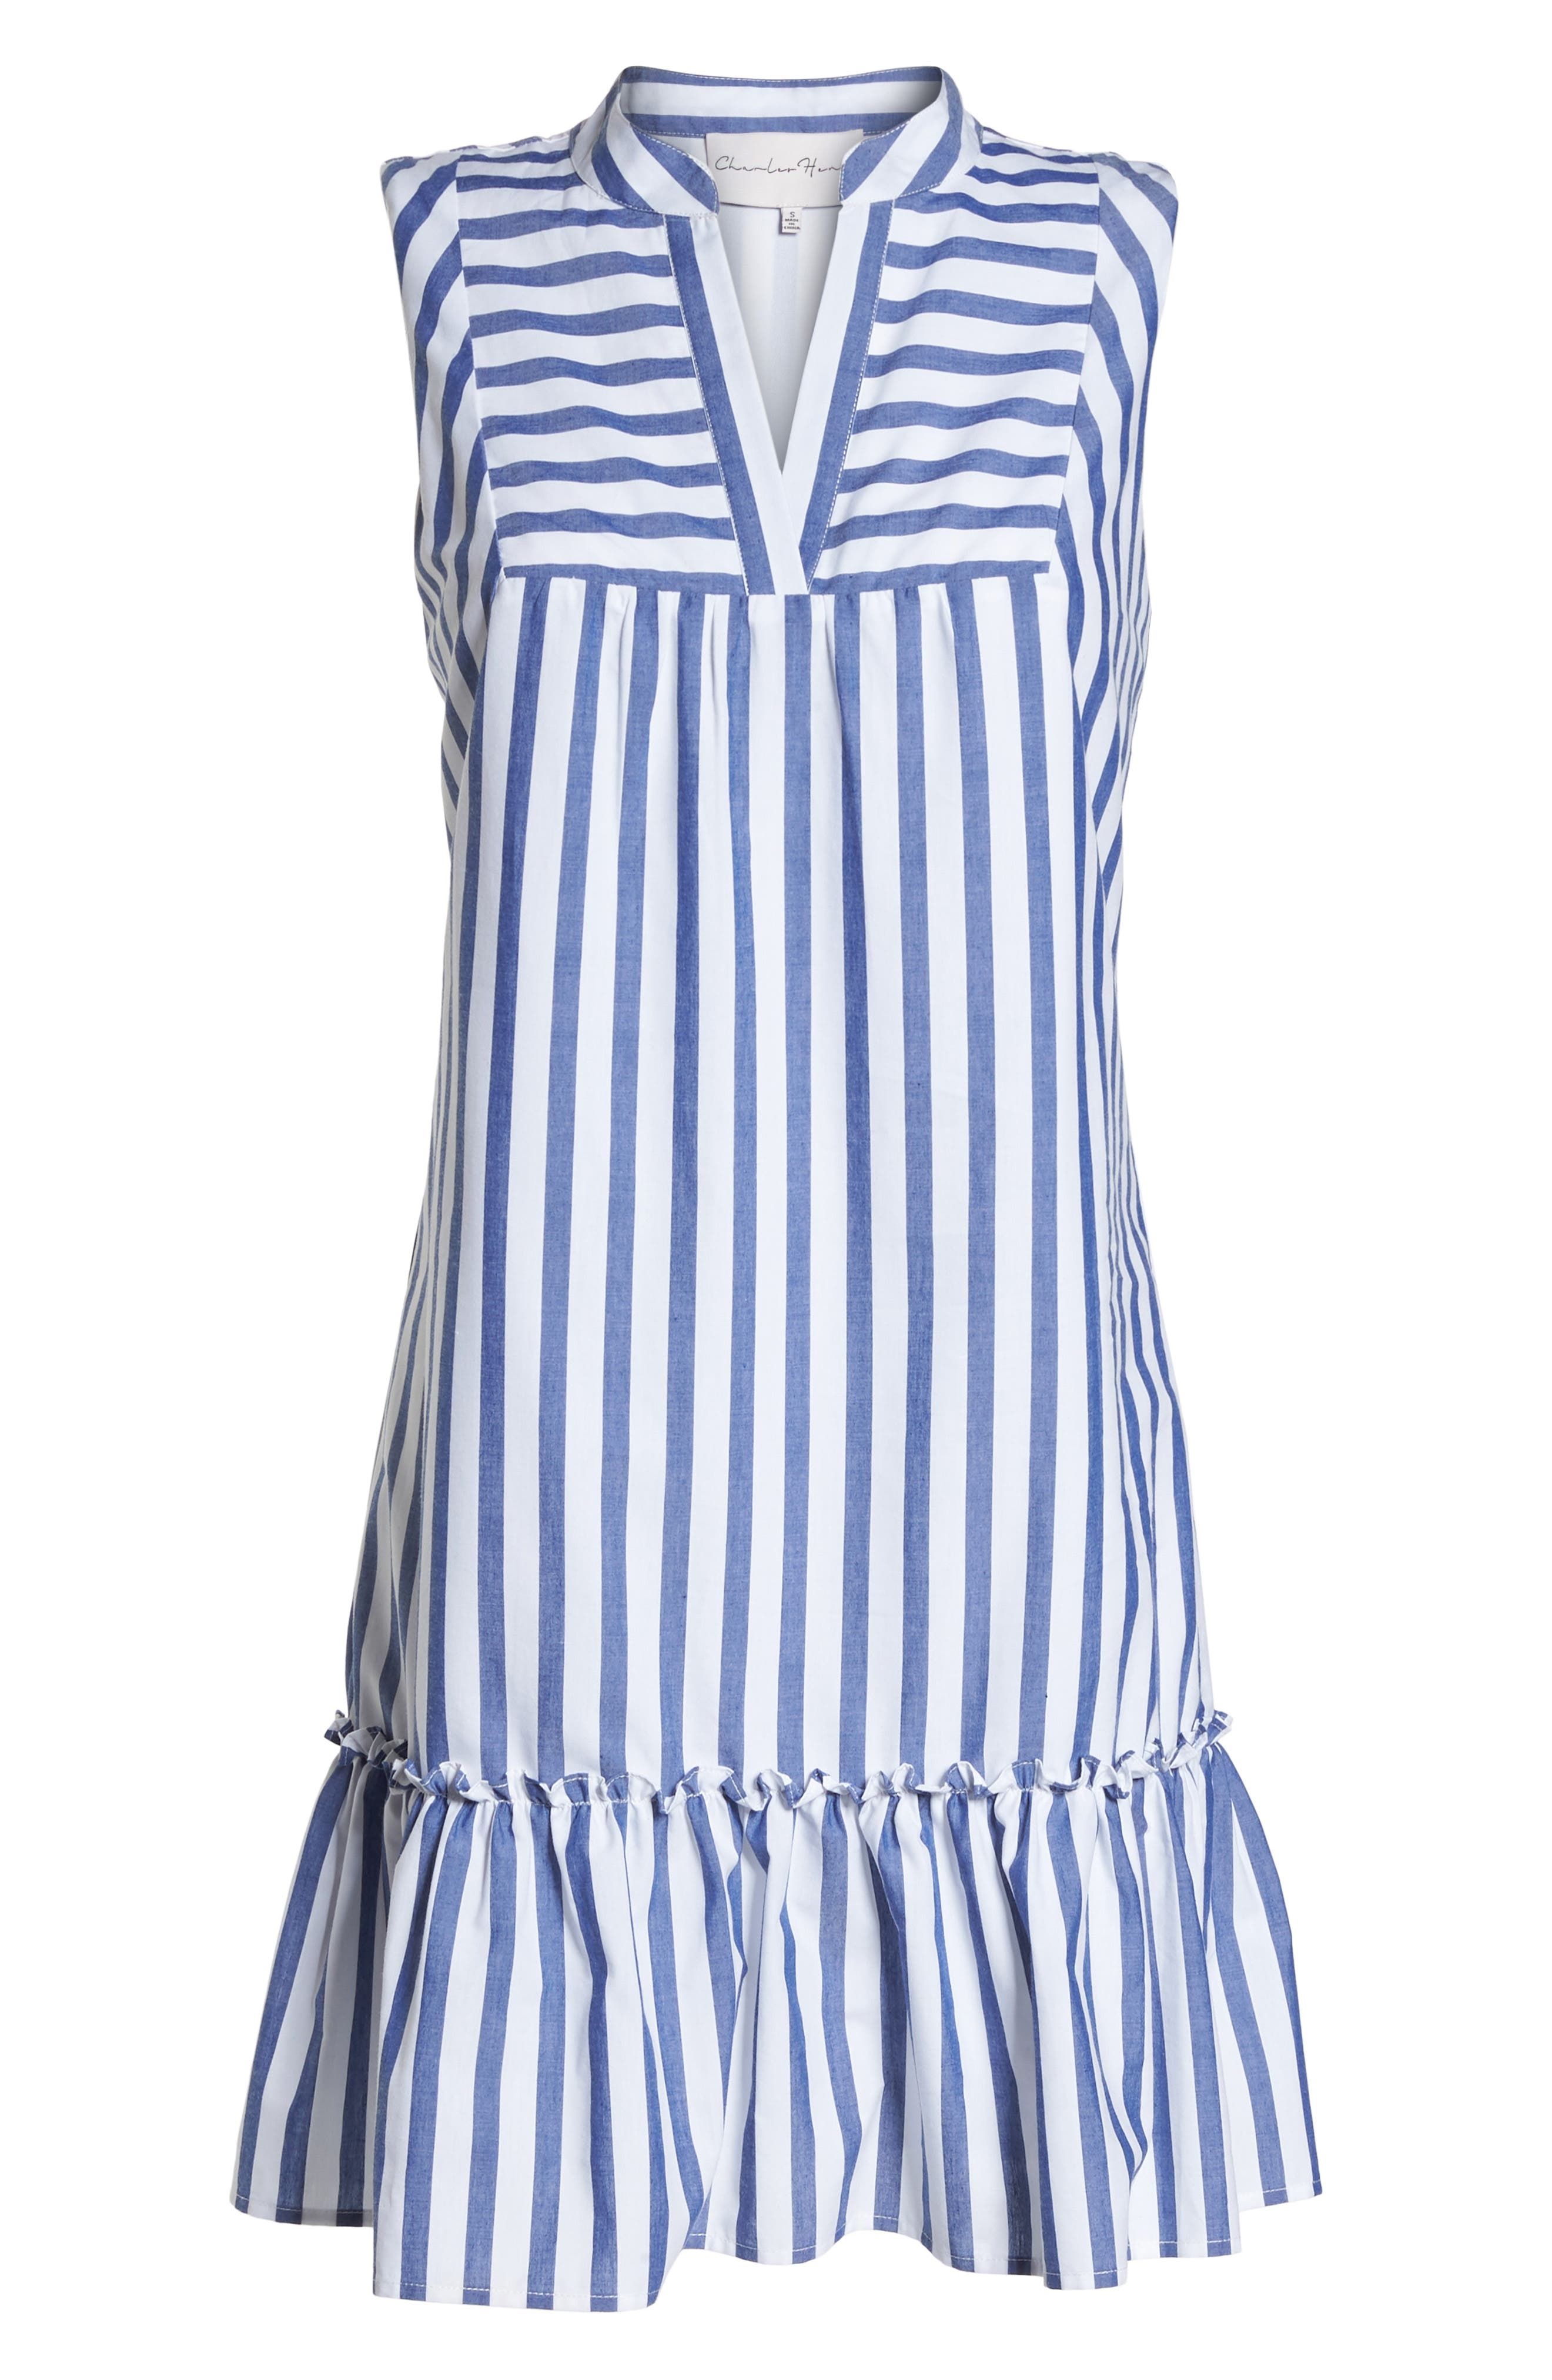 Stripe Bib Front Sleeveless Shift Dress,                             Alternate thumbnail 7, color,                             Ivory/ Blue Stripe